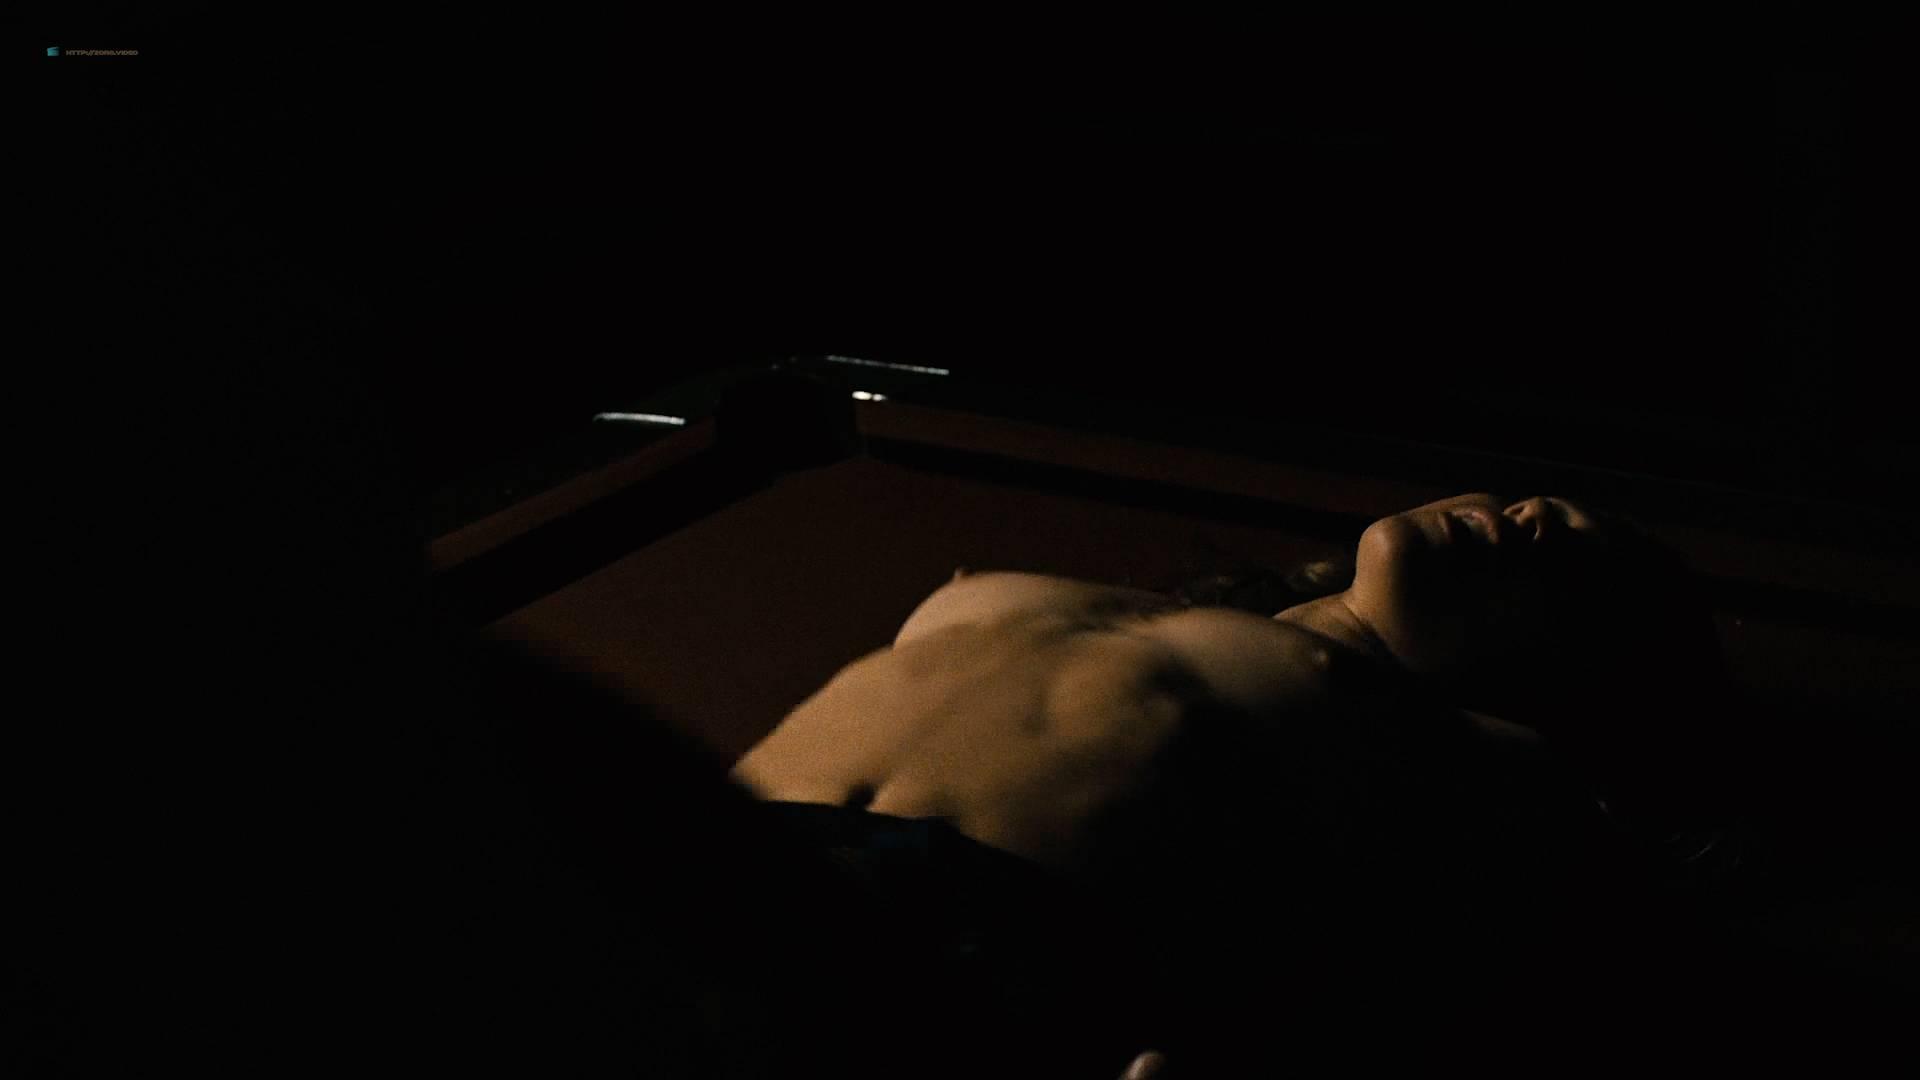 Maggie Gyllenhaal nude oral Margarita Levieva nude sex Kayla Foster lesbian - The Deuce (2017) s1e4 HD1080p (4)